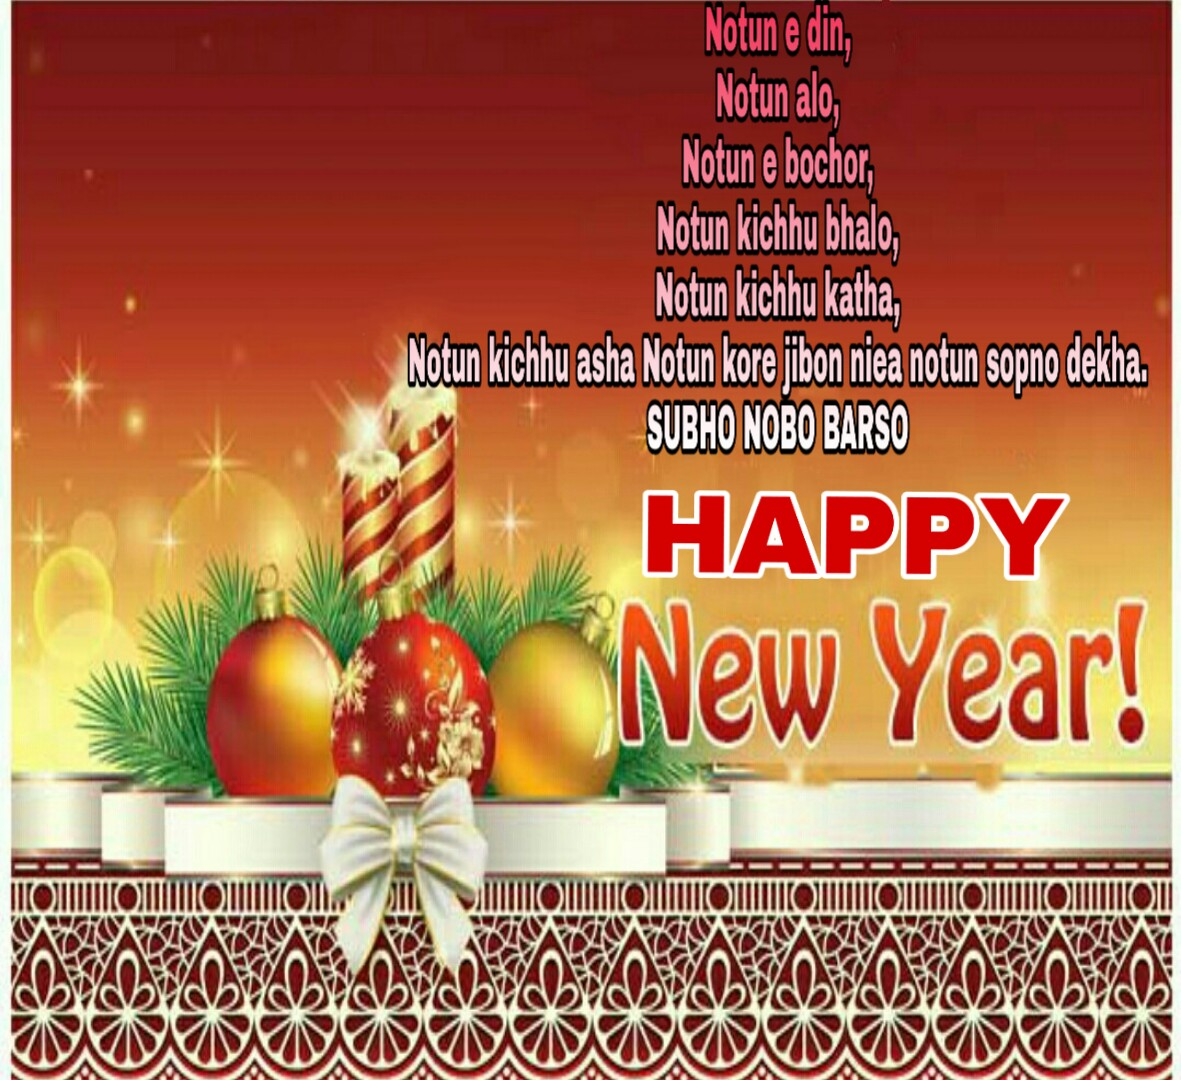 Happy New Year Wishes In Bengali Language 2019 Happy New Year